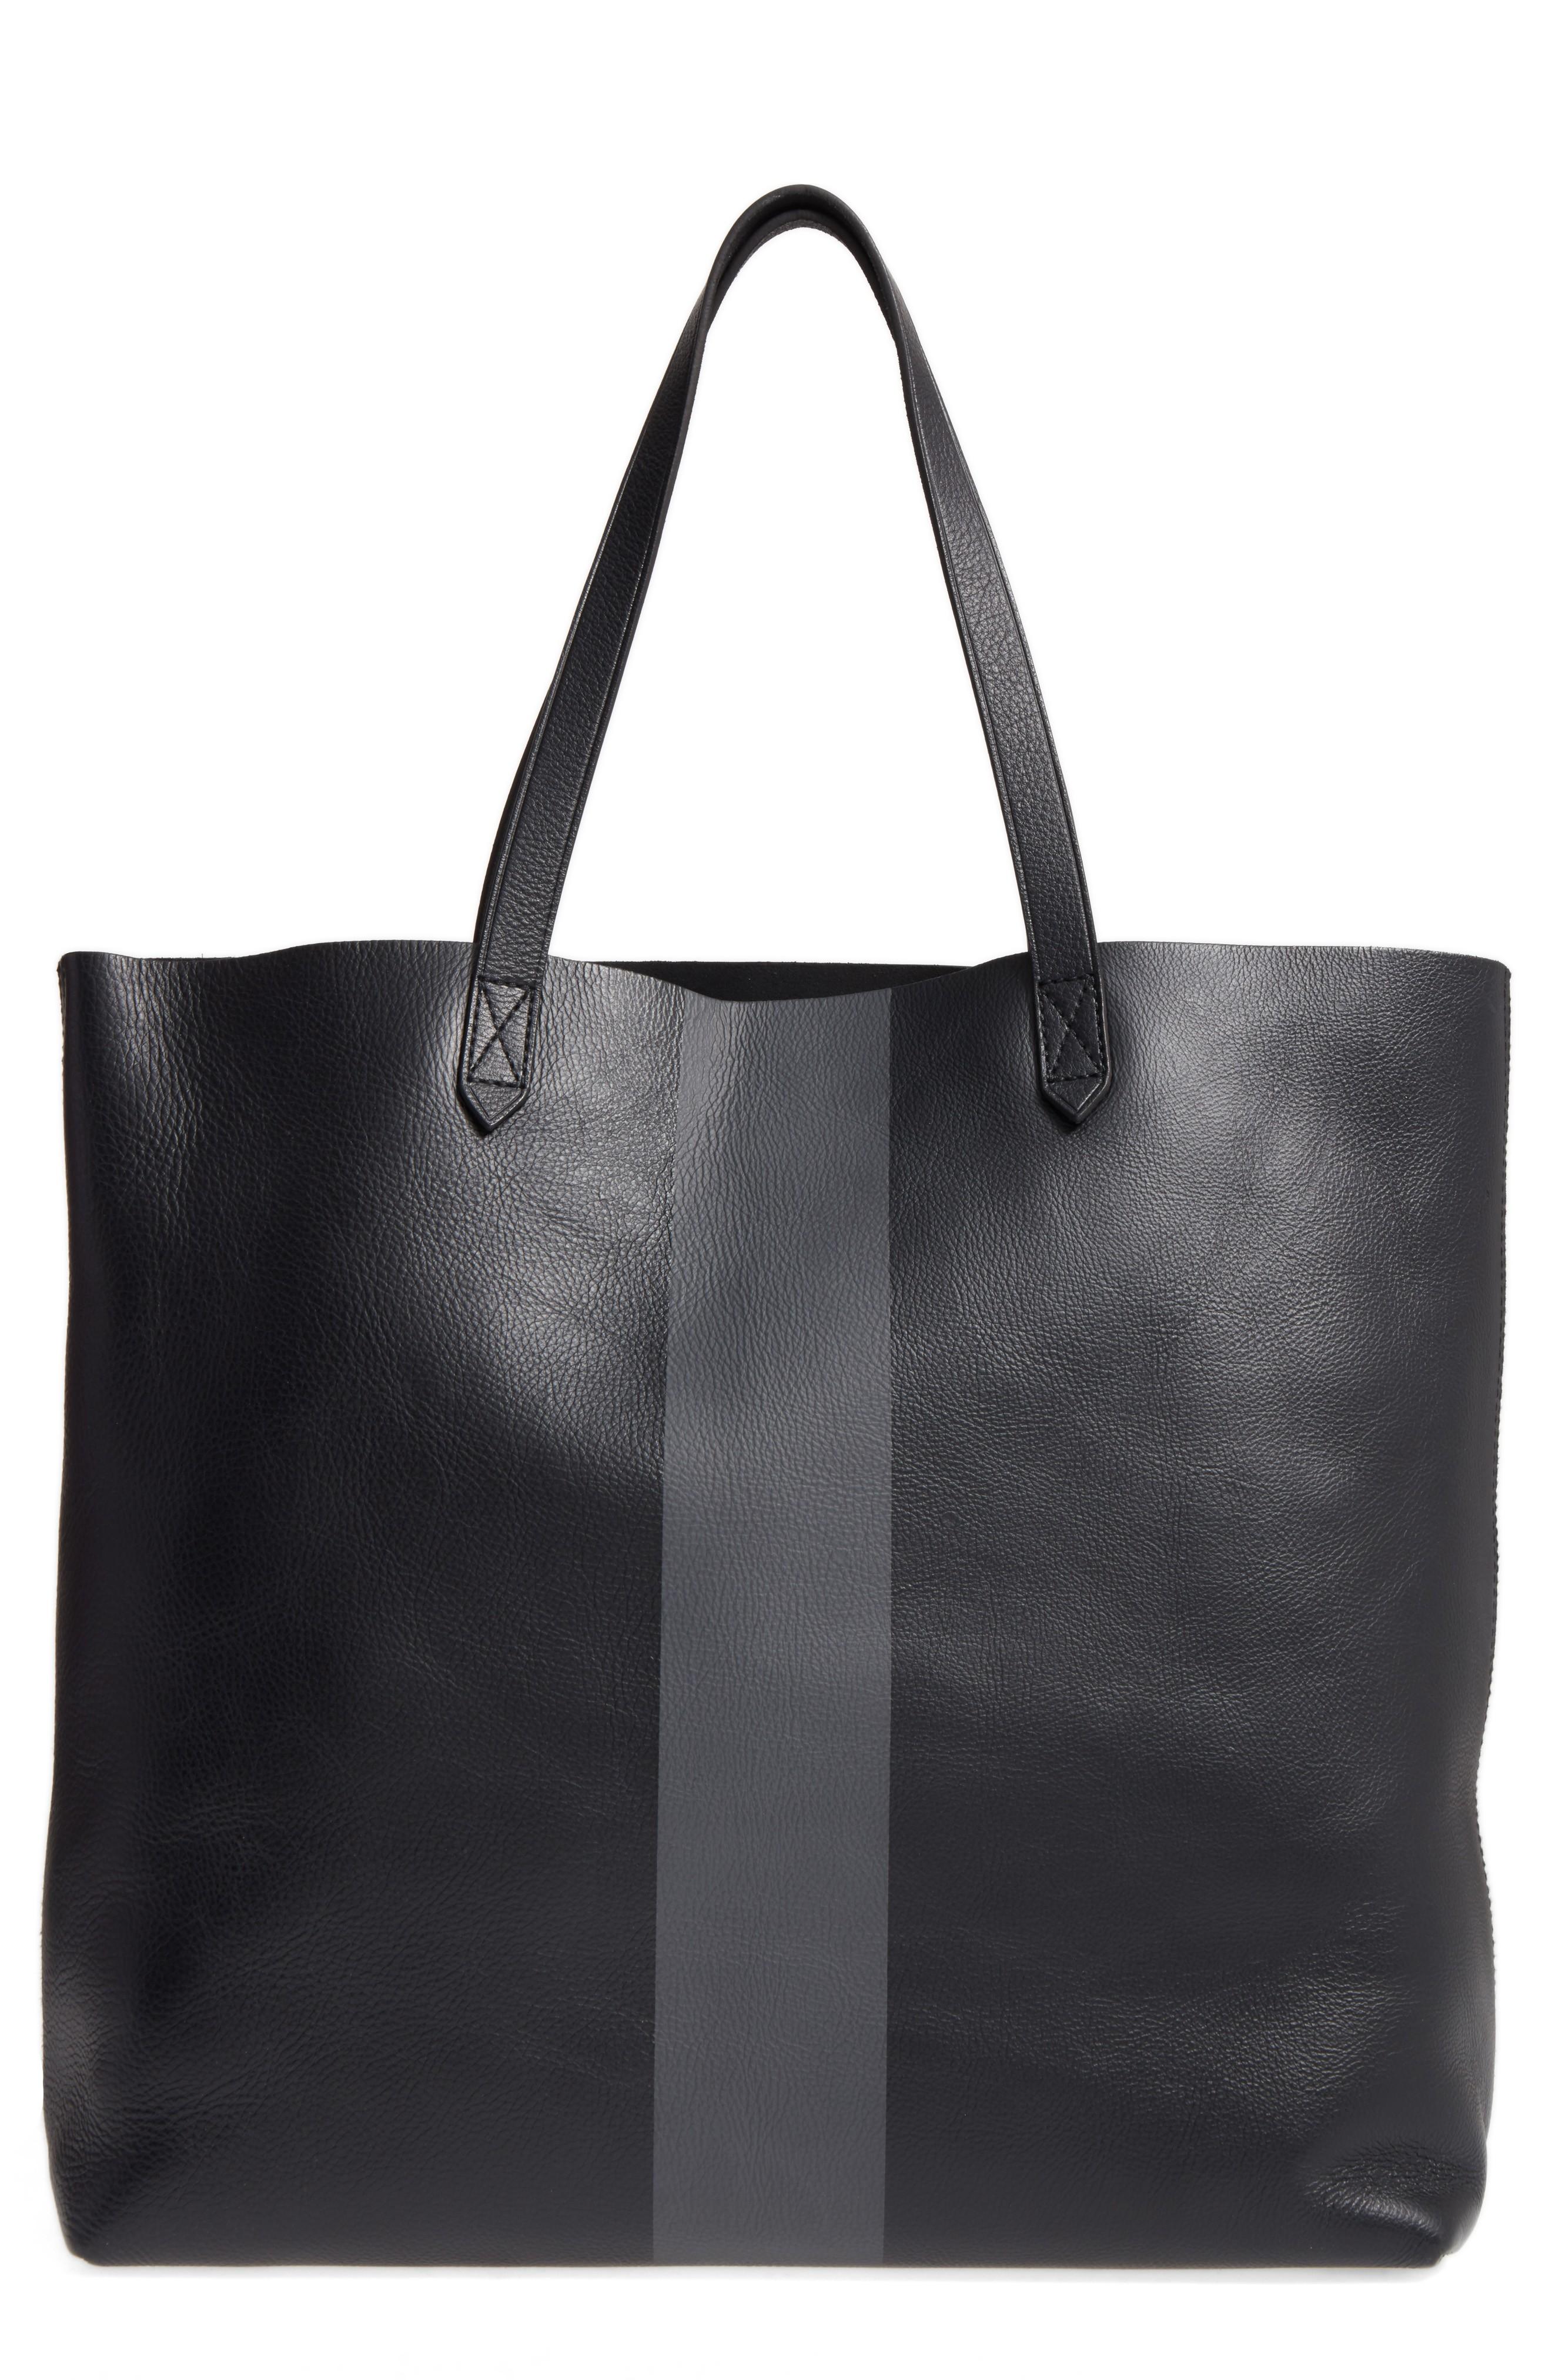 black bags handbags u0026 purses | nordstrom WXHKQLC